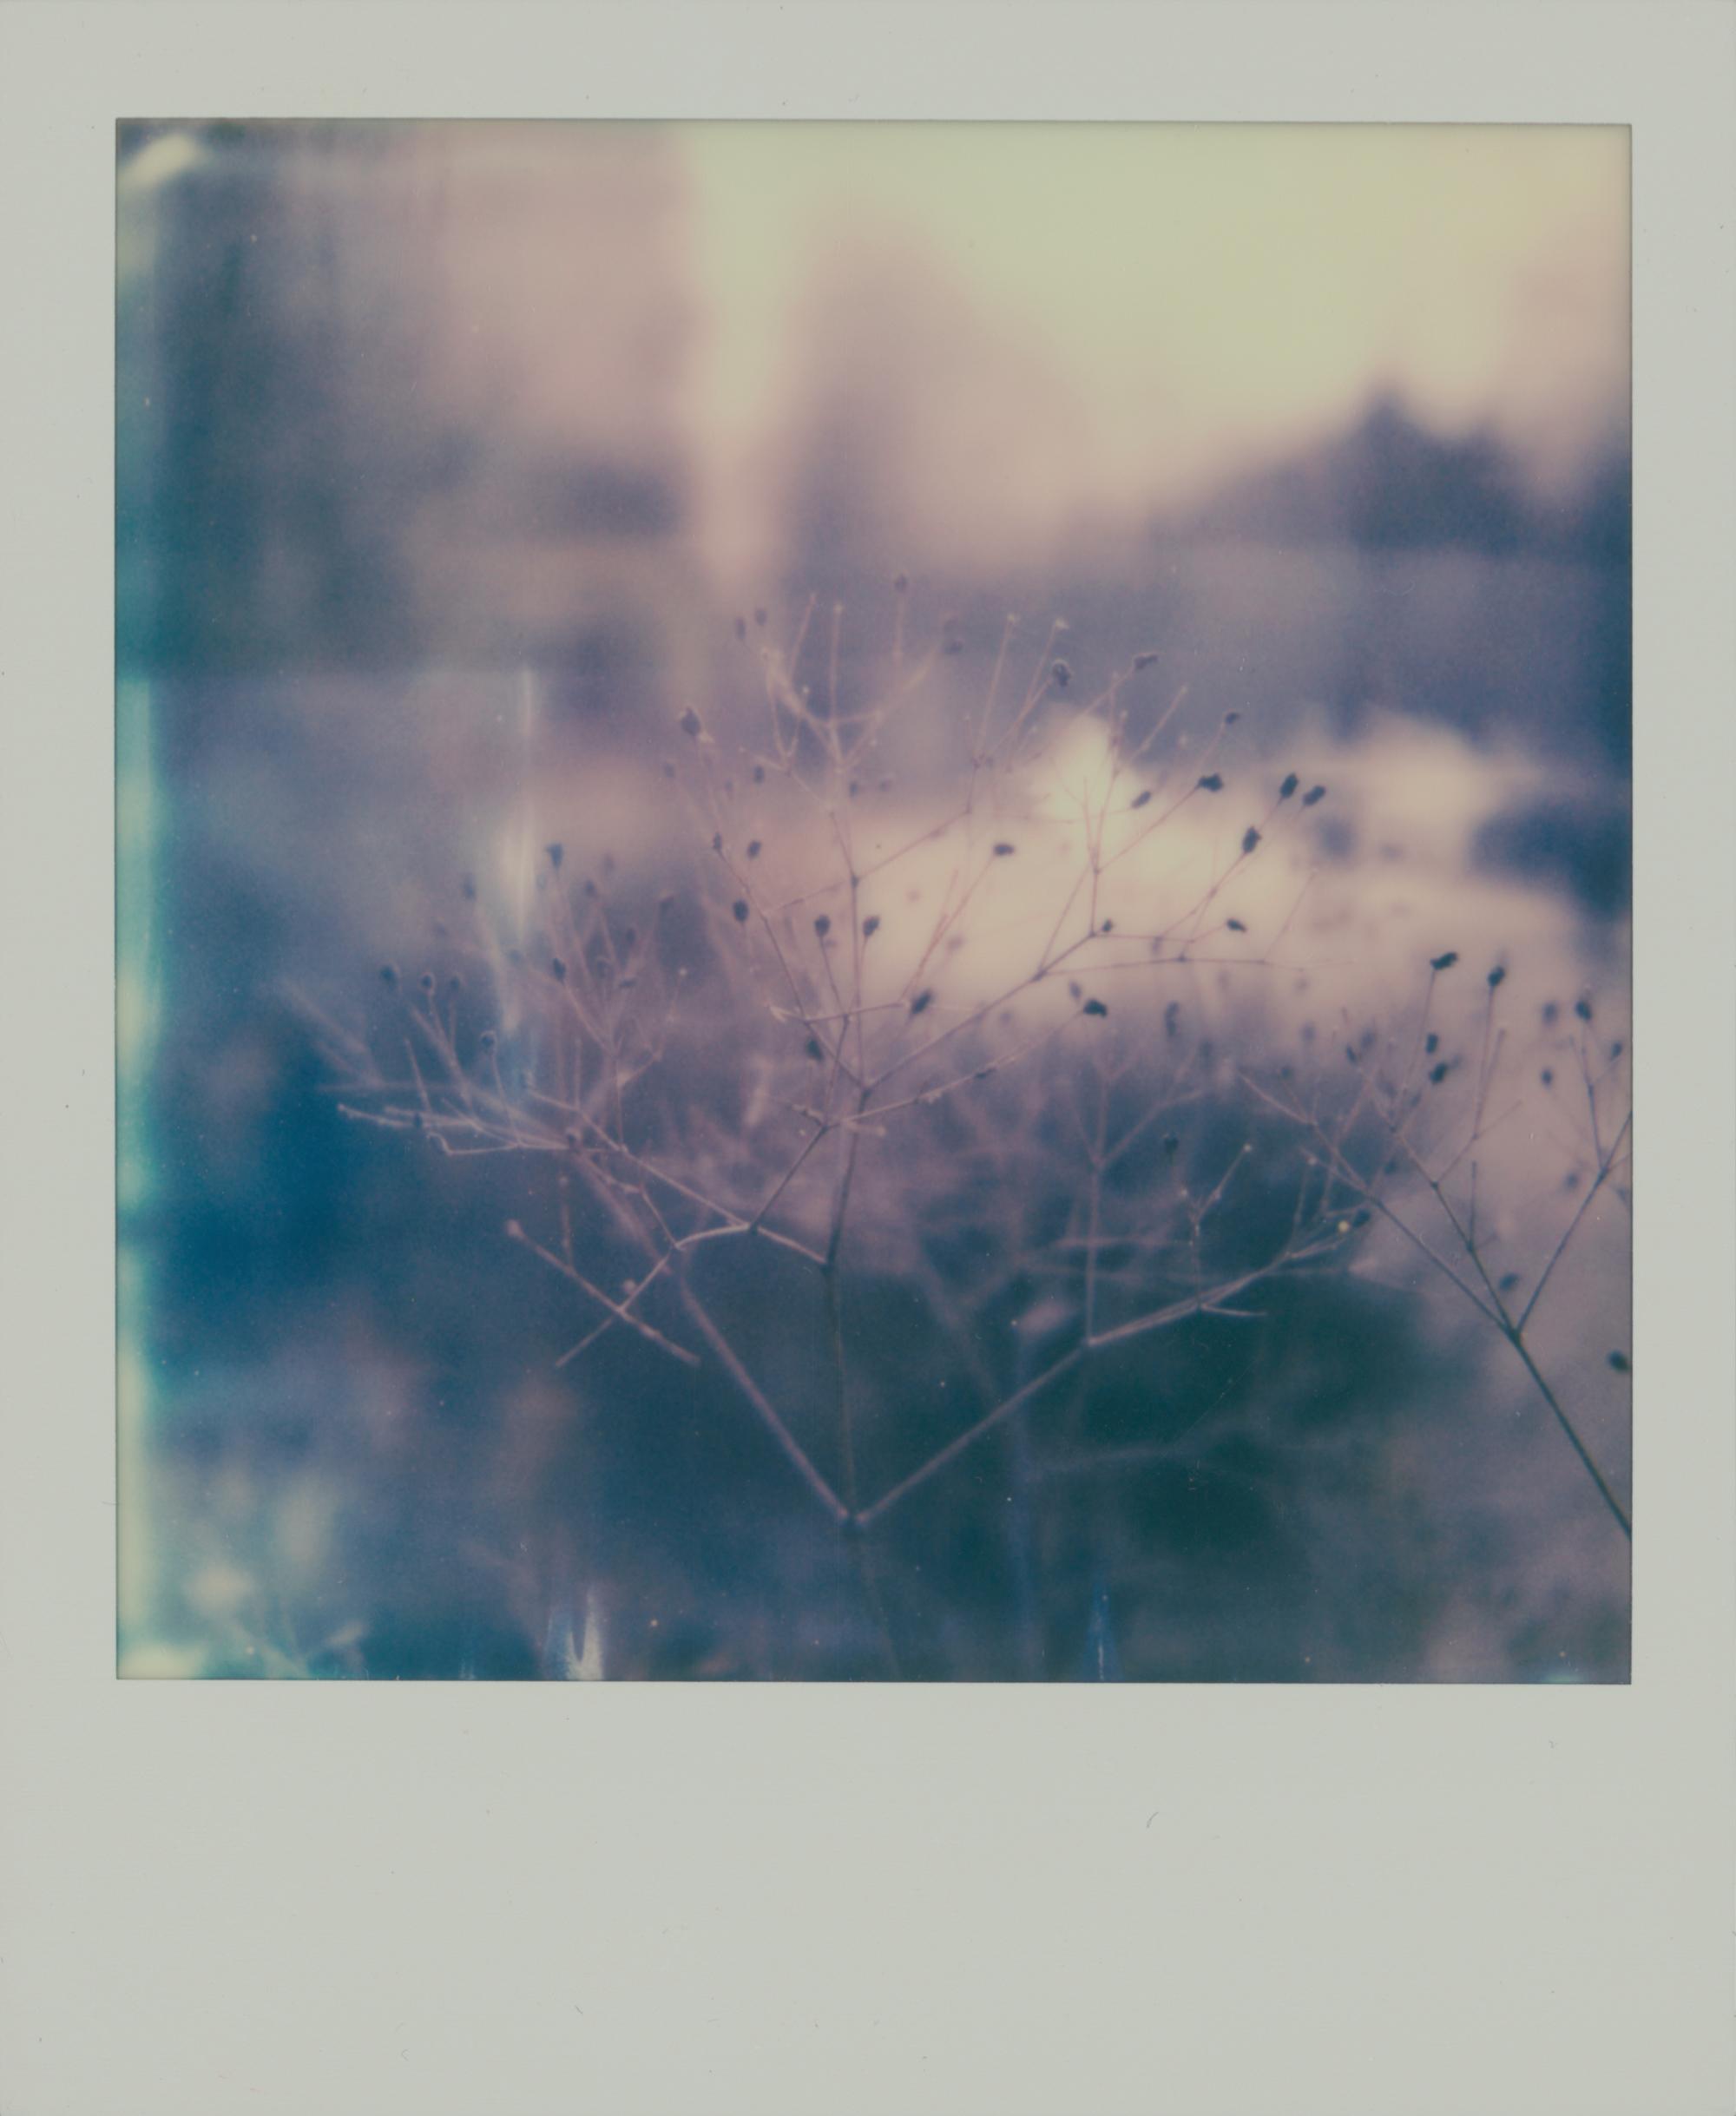 © Noemi Heidel (Berlin, Germany) | The Space Between Thoughts